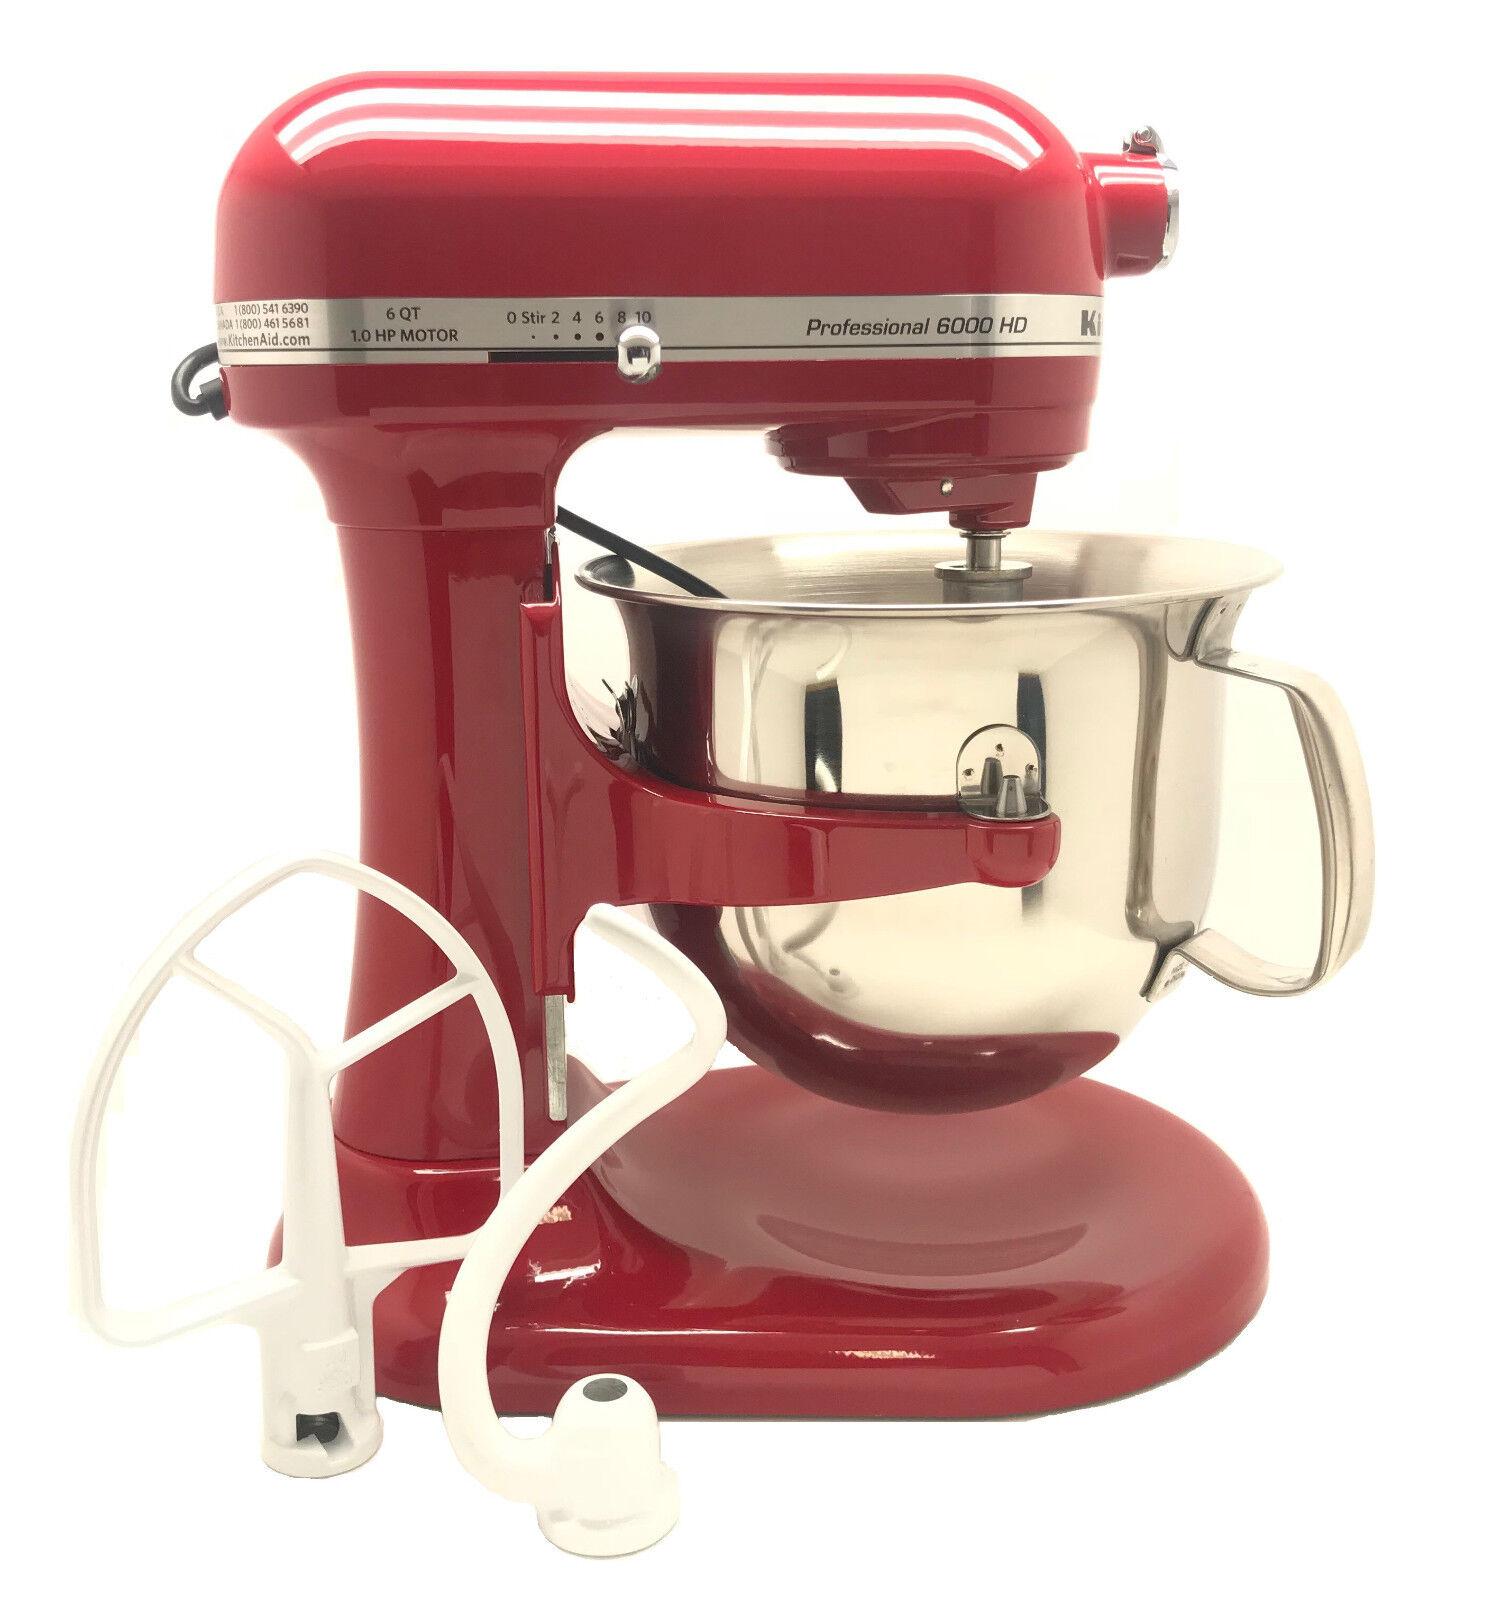 Qt Kitchenaid Bowl Lift Stand Mixer on portable drum mixer stand, kitchenaid 6 qt glass bowl, kitchenaid artisan stand mixer cobalt blue, kitchenaid classic stand mixer,